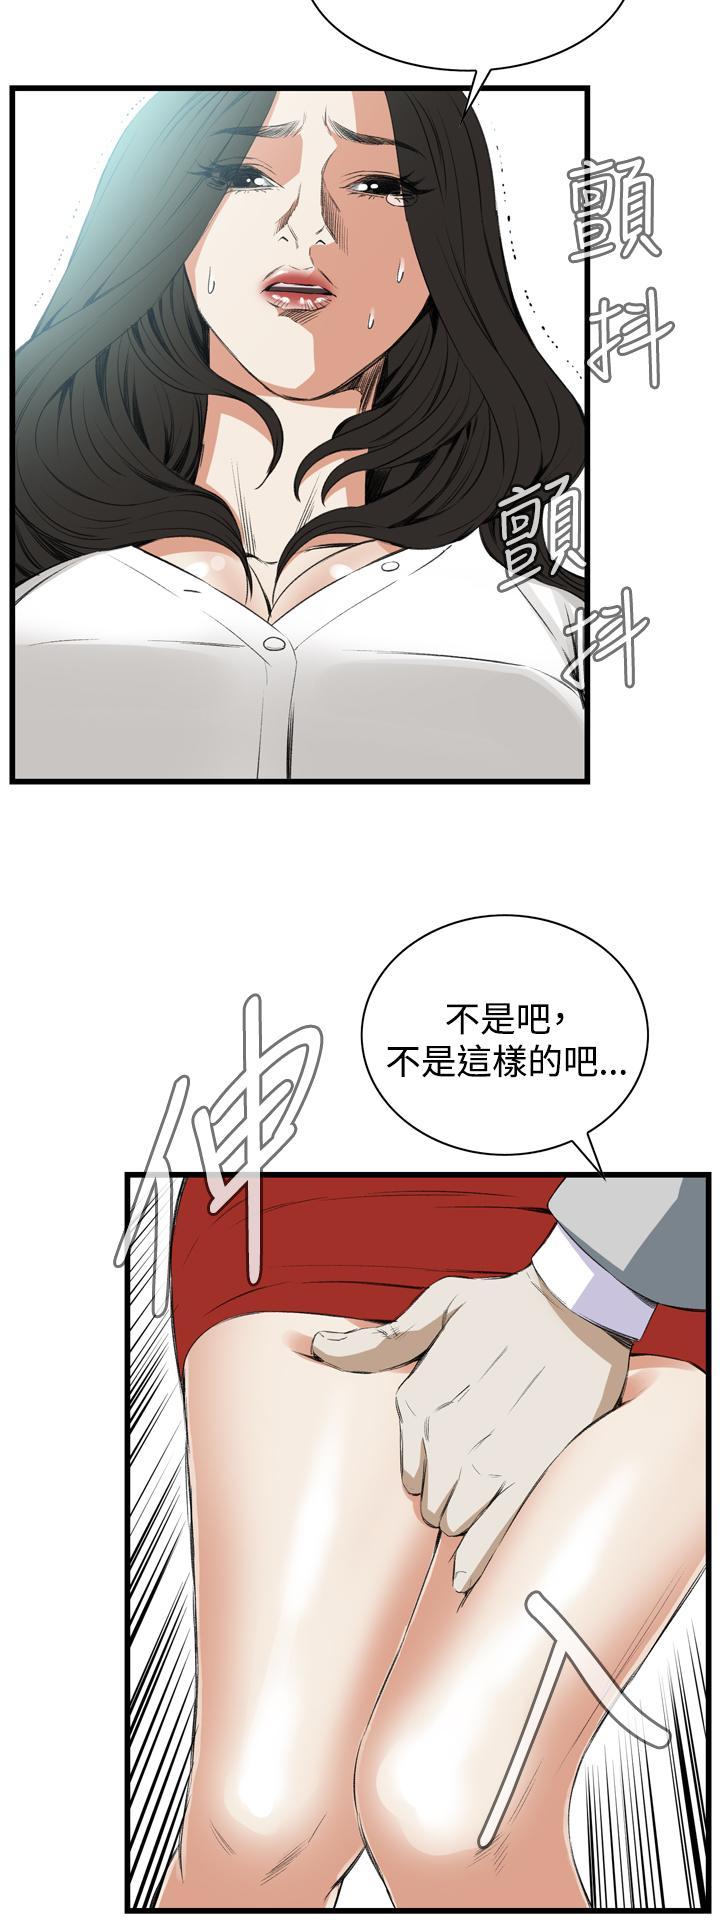 Take a Peek 偷窥 Ch.39~51 [Chinese]中文 308